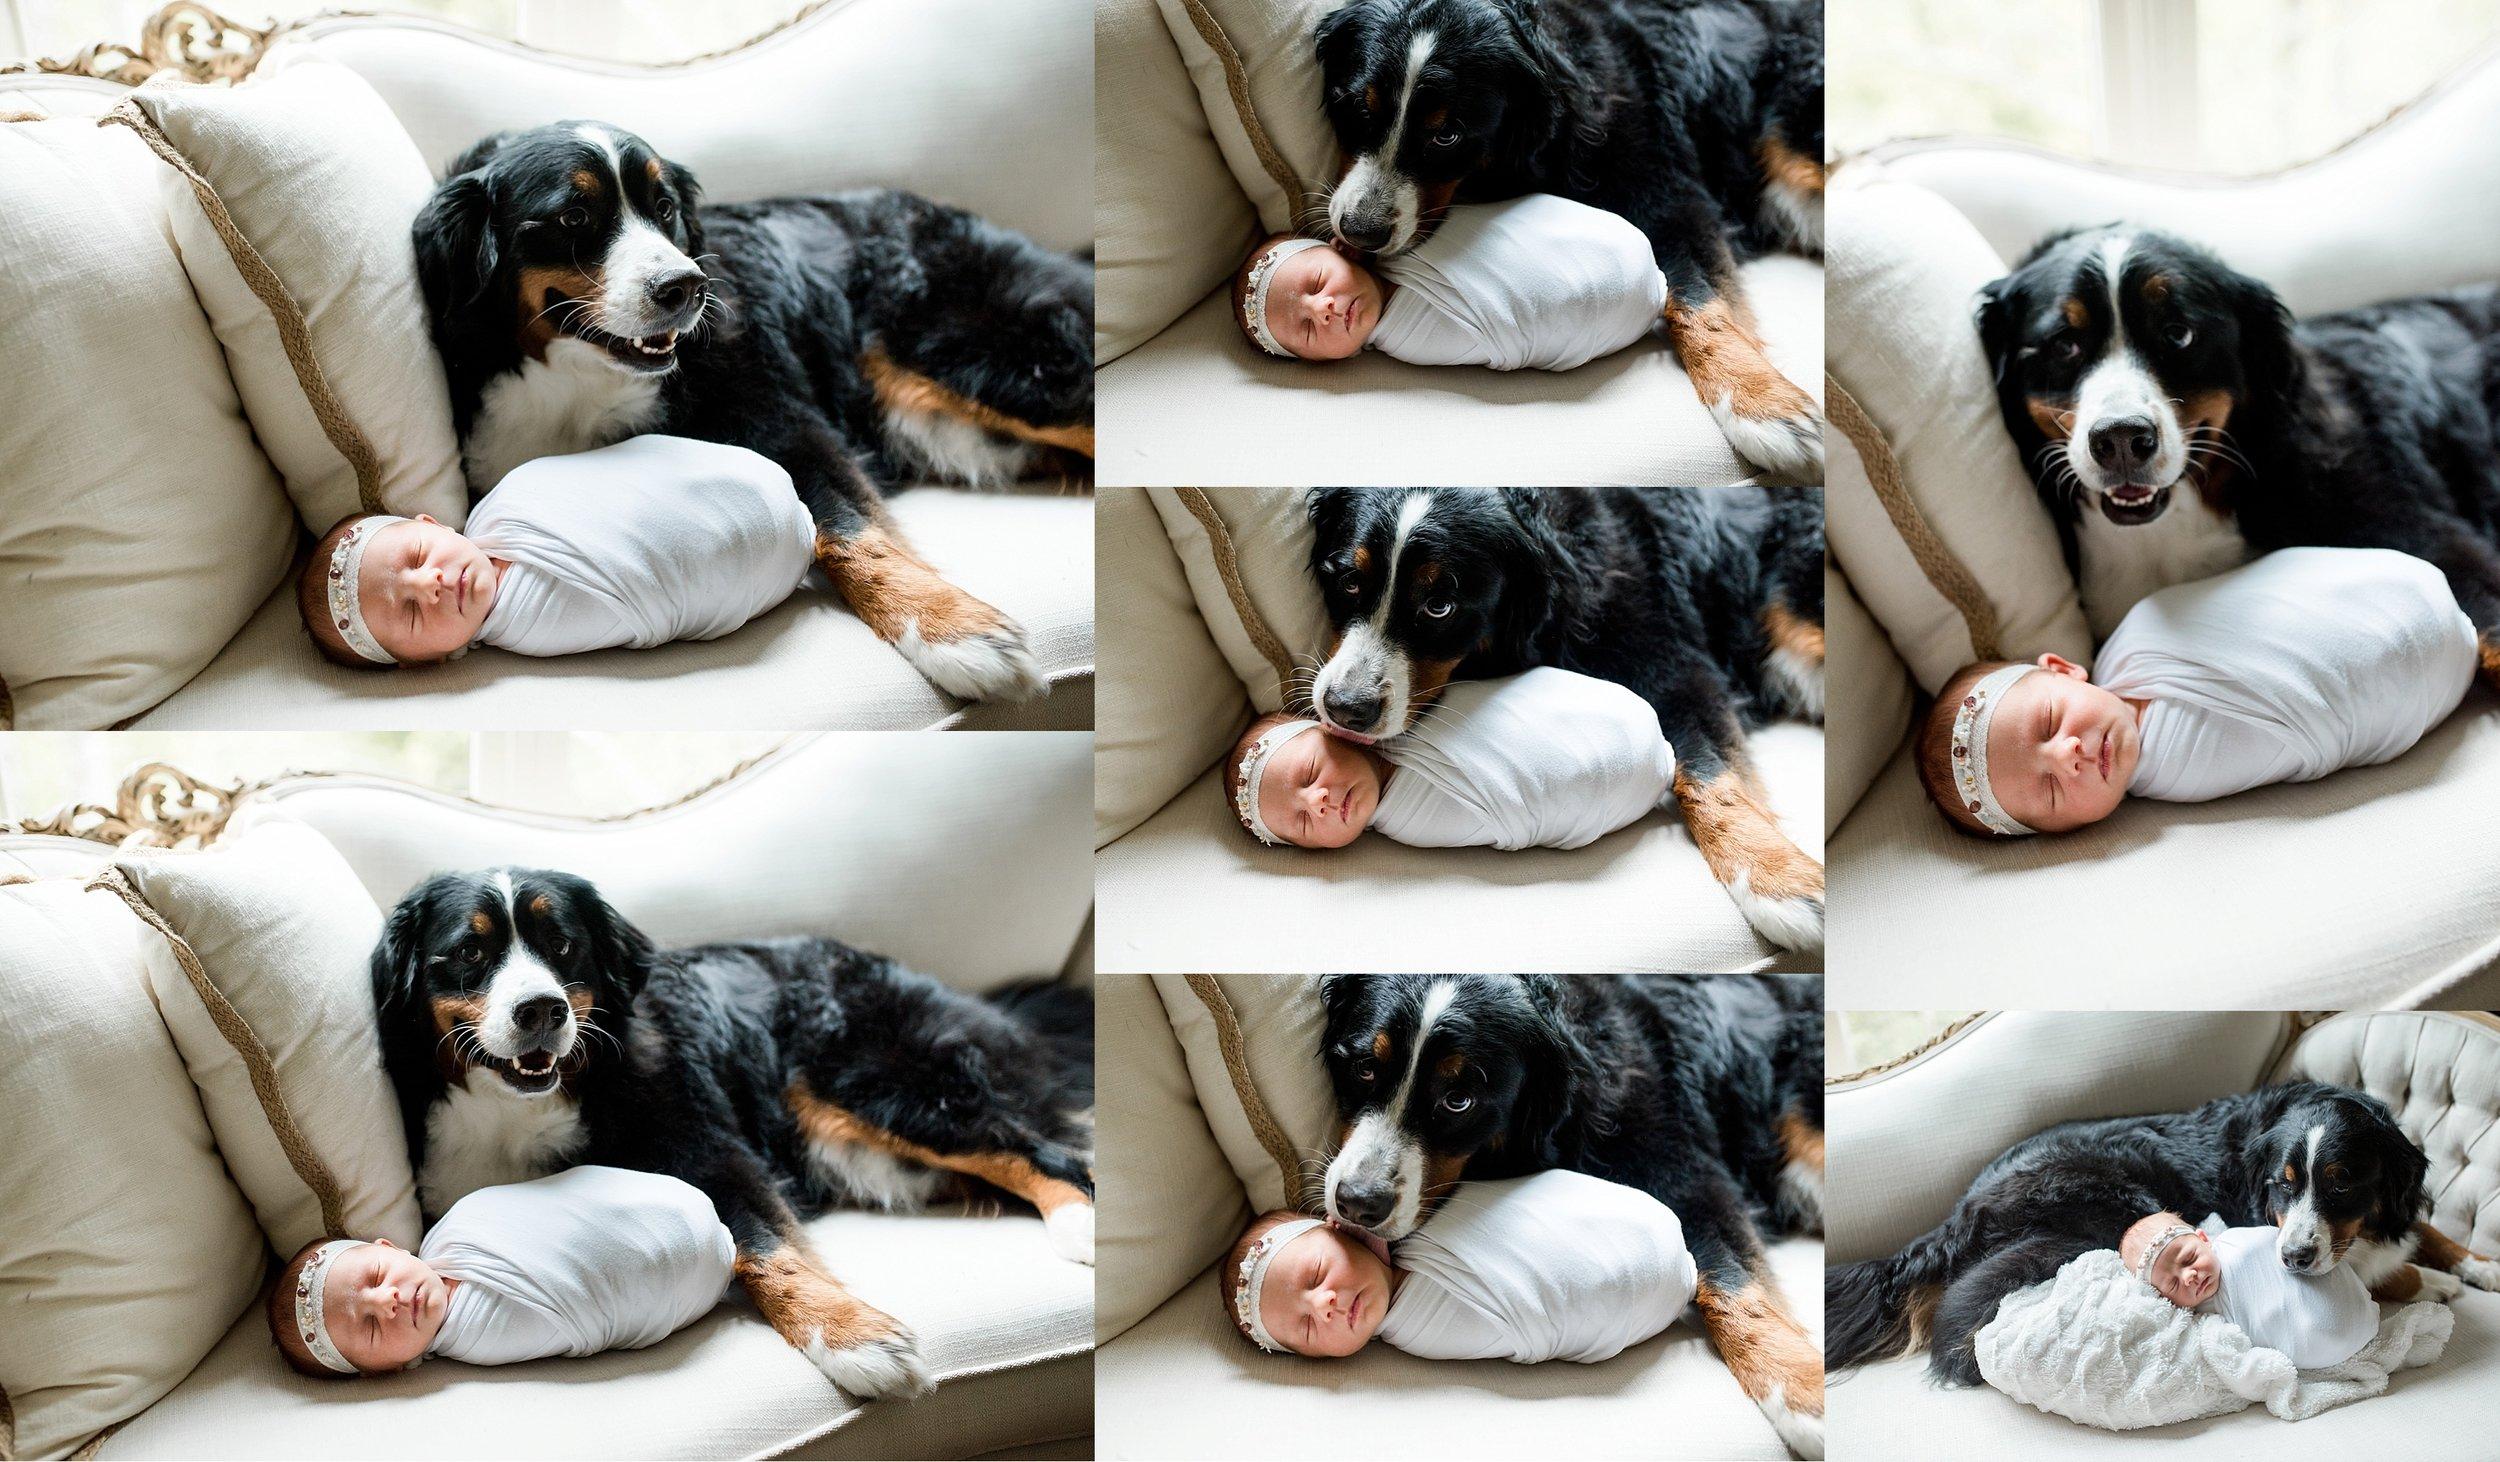 Dog and newborn photos